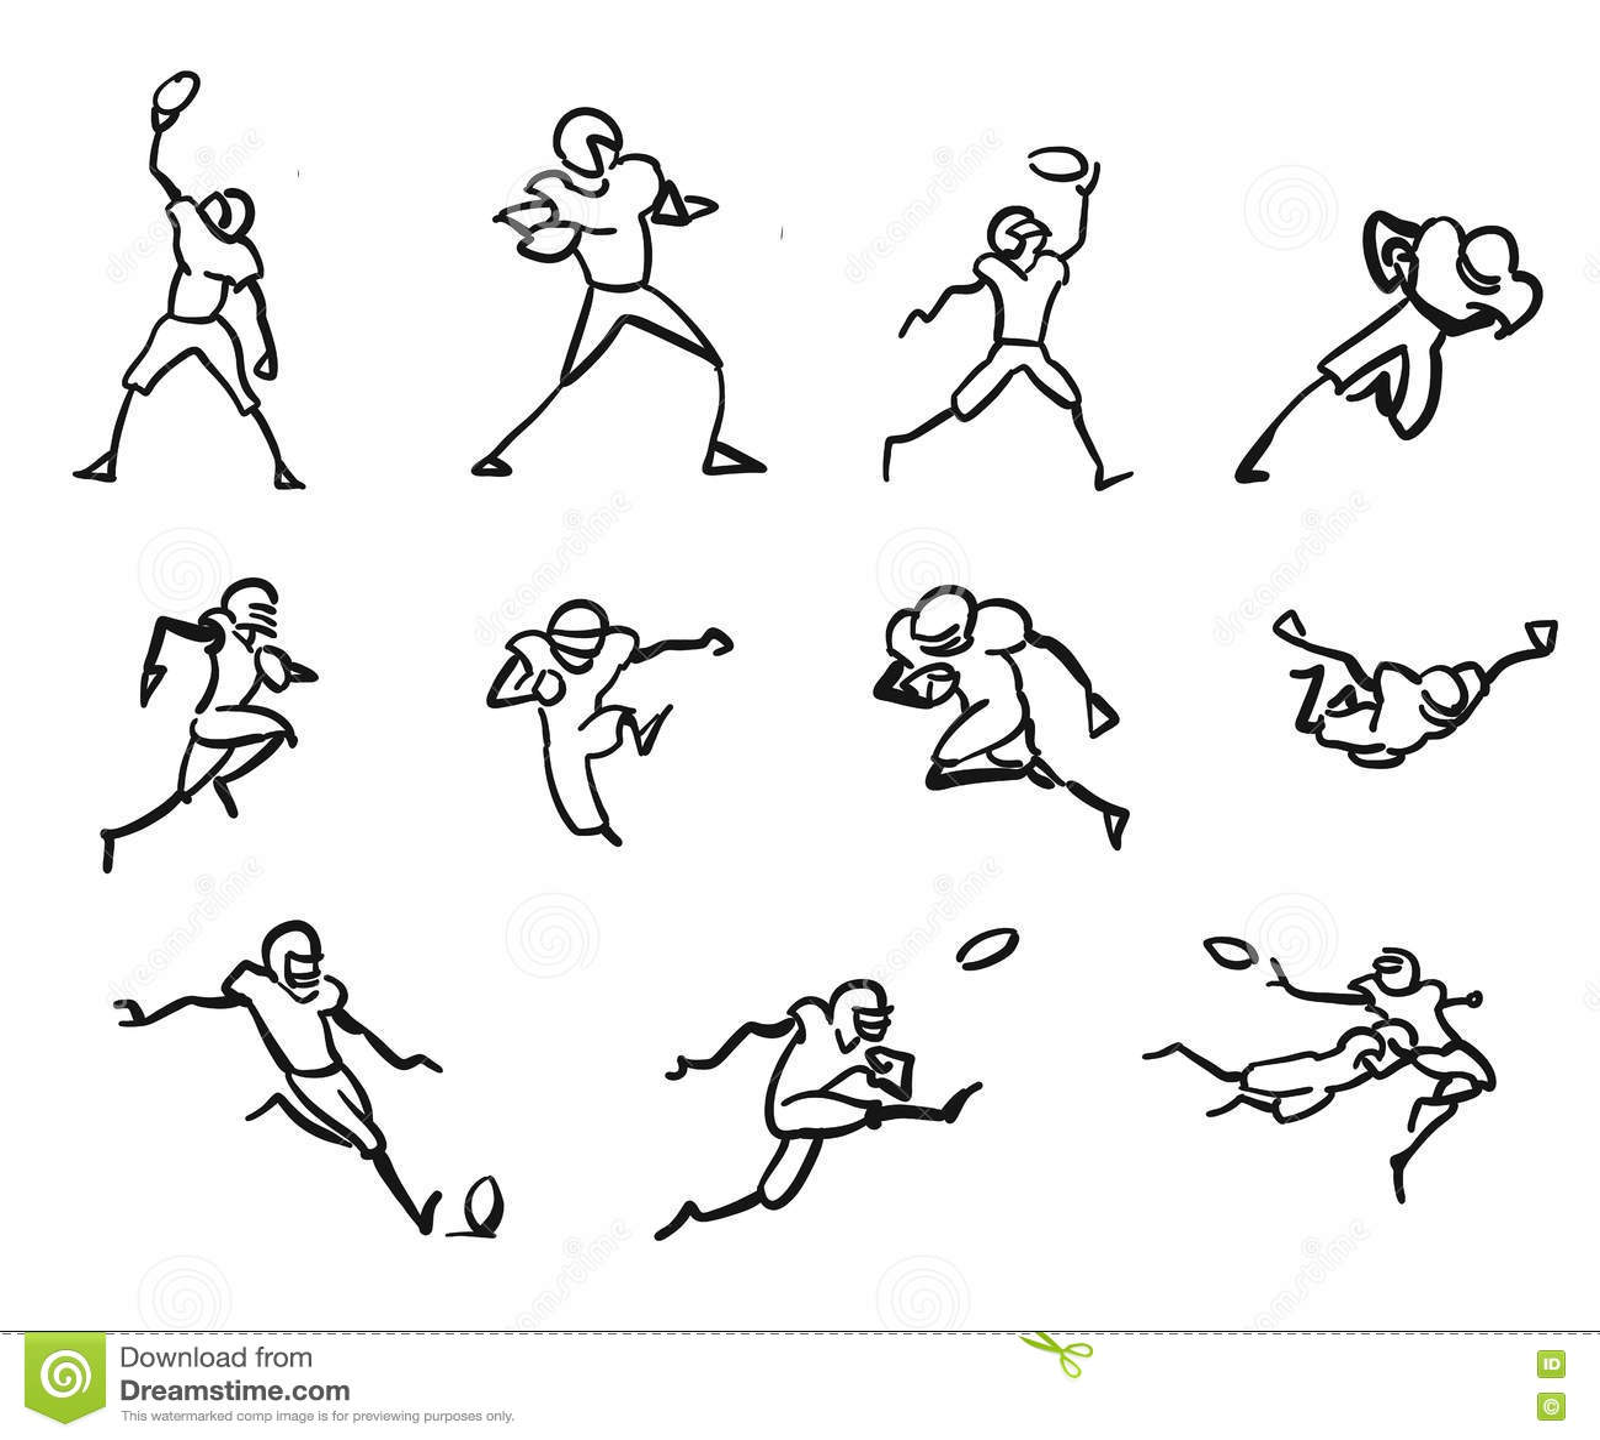 American Football Player Motion Sketch Stu S Stock Vector